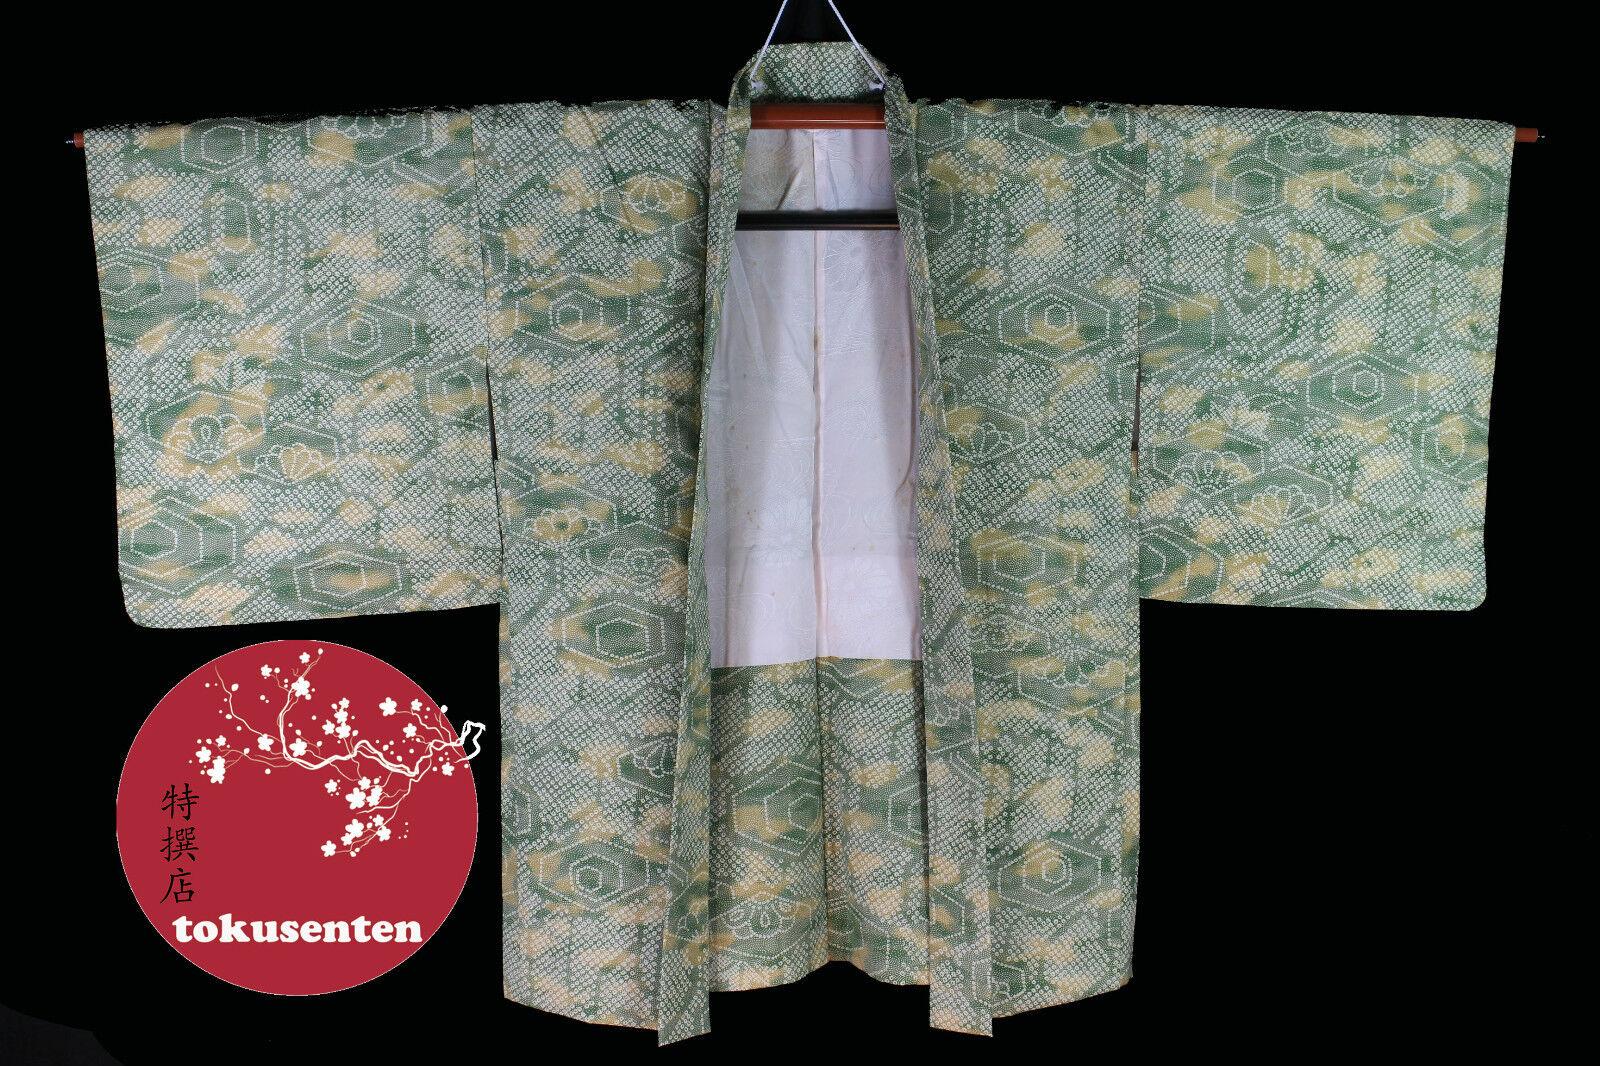 JAPANESE KIMONO AUTHENTIC REAL SEDA SETA SILK MADE IN JAPAN RARE VINTAGE